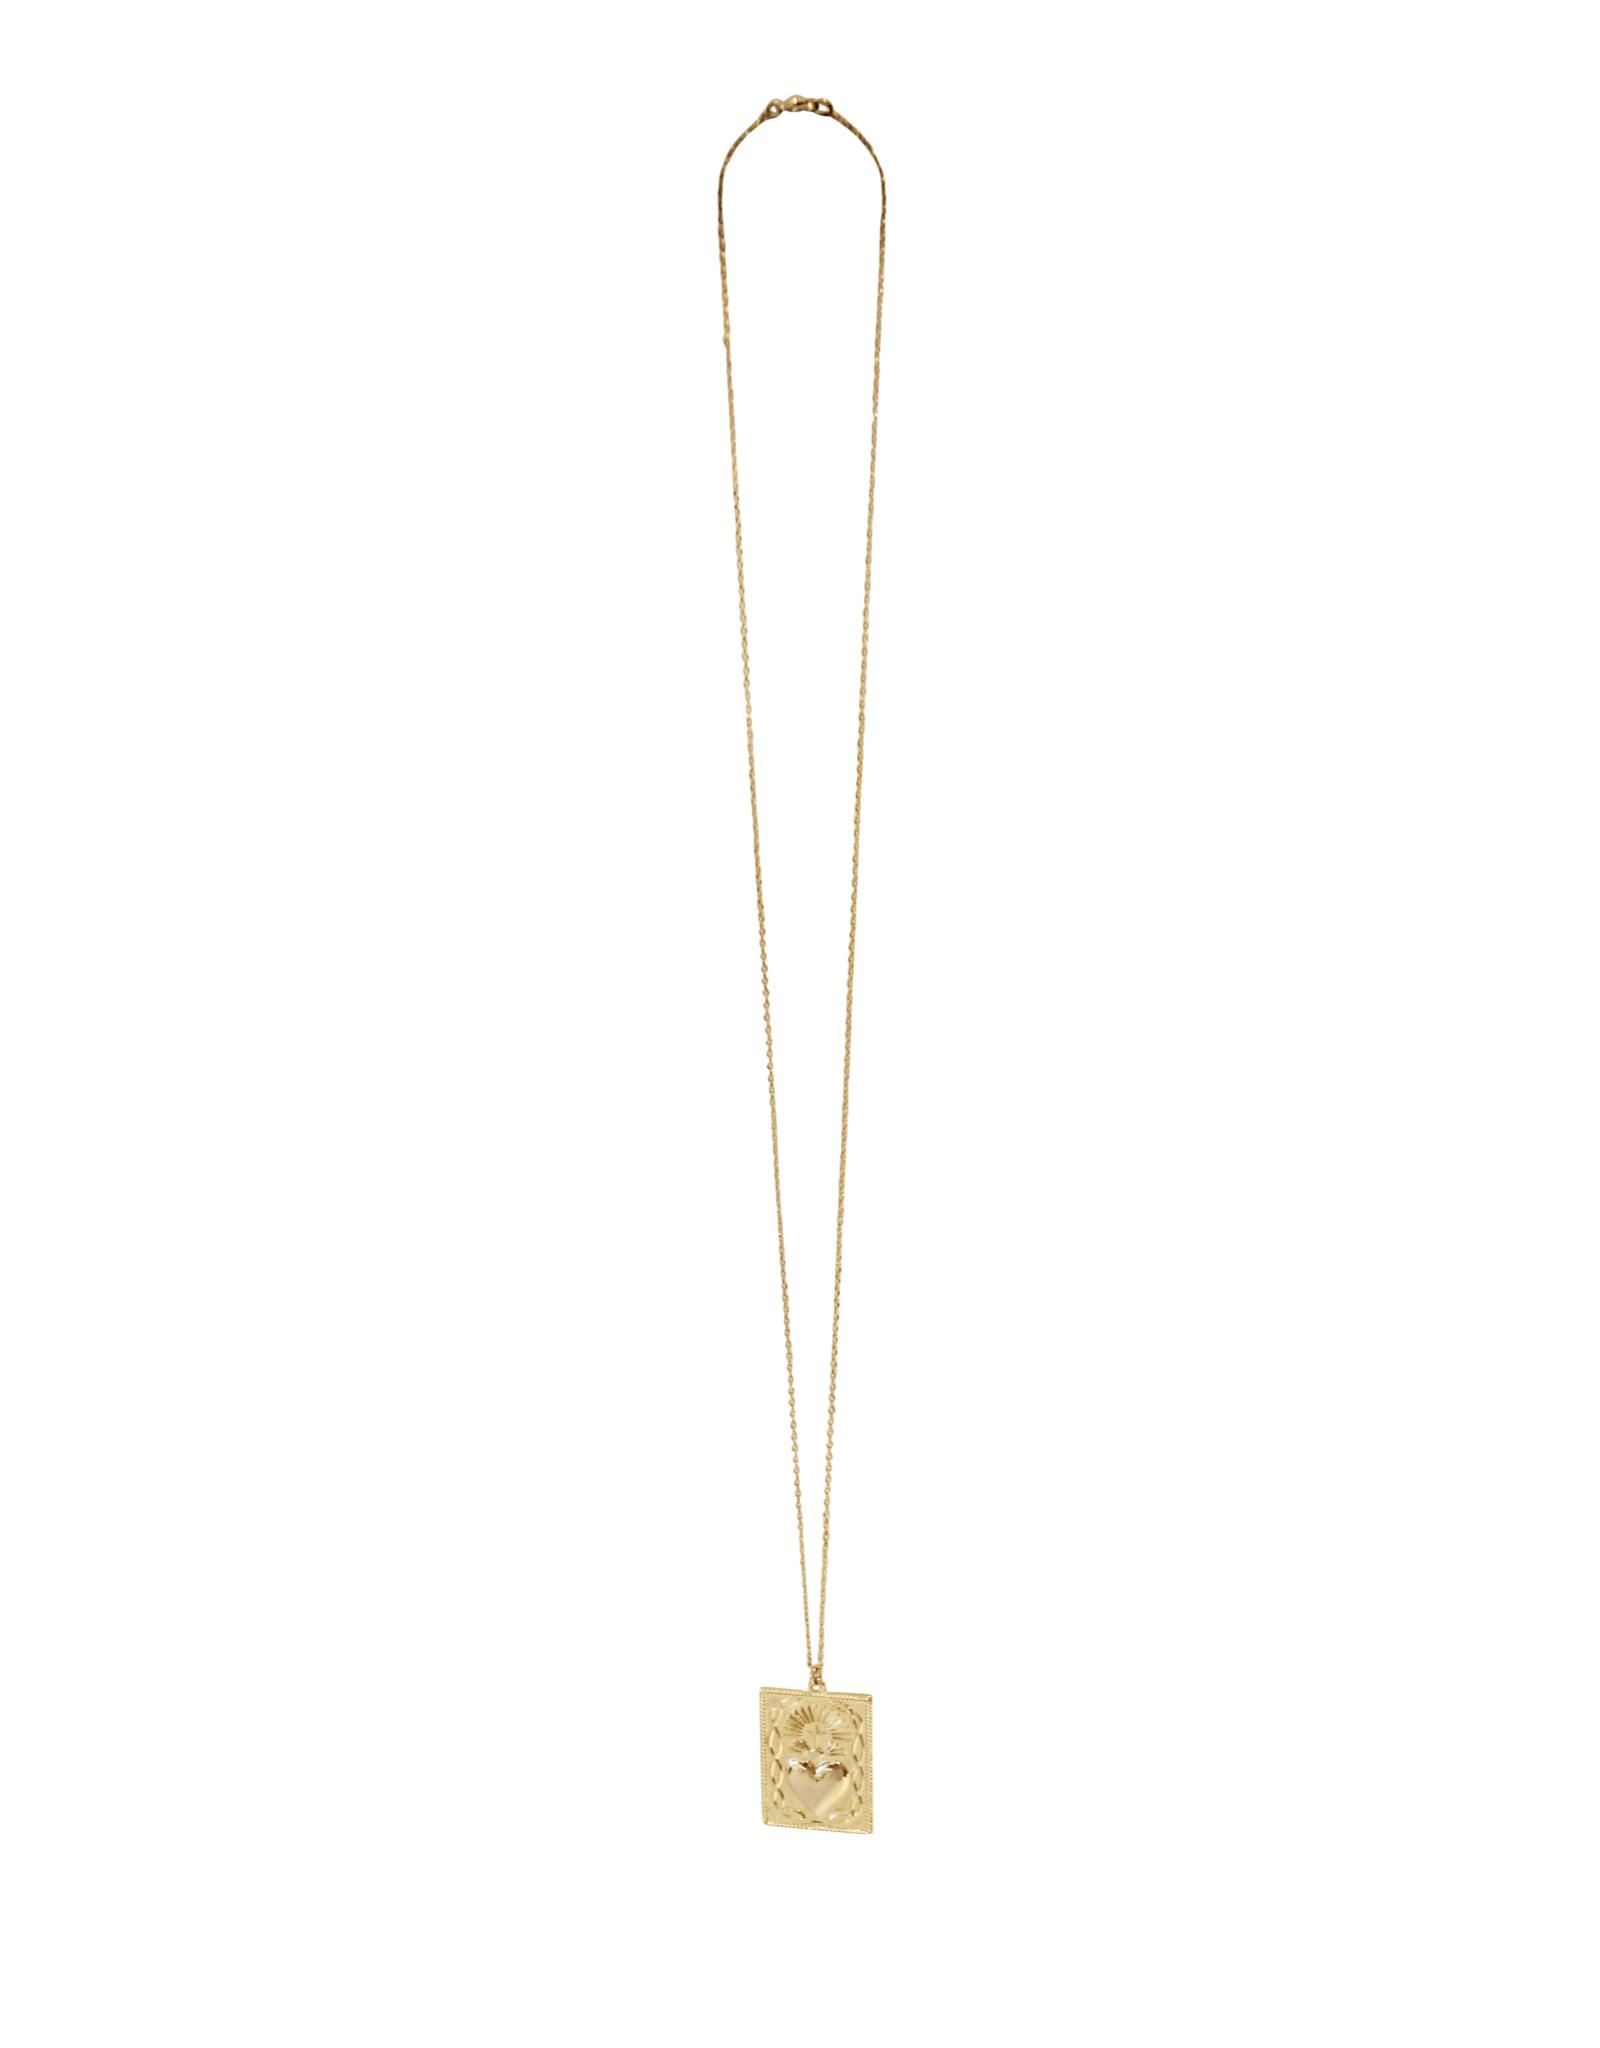 Vayu Jewels Marisol Necklace